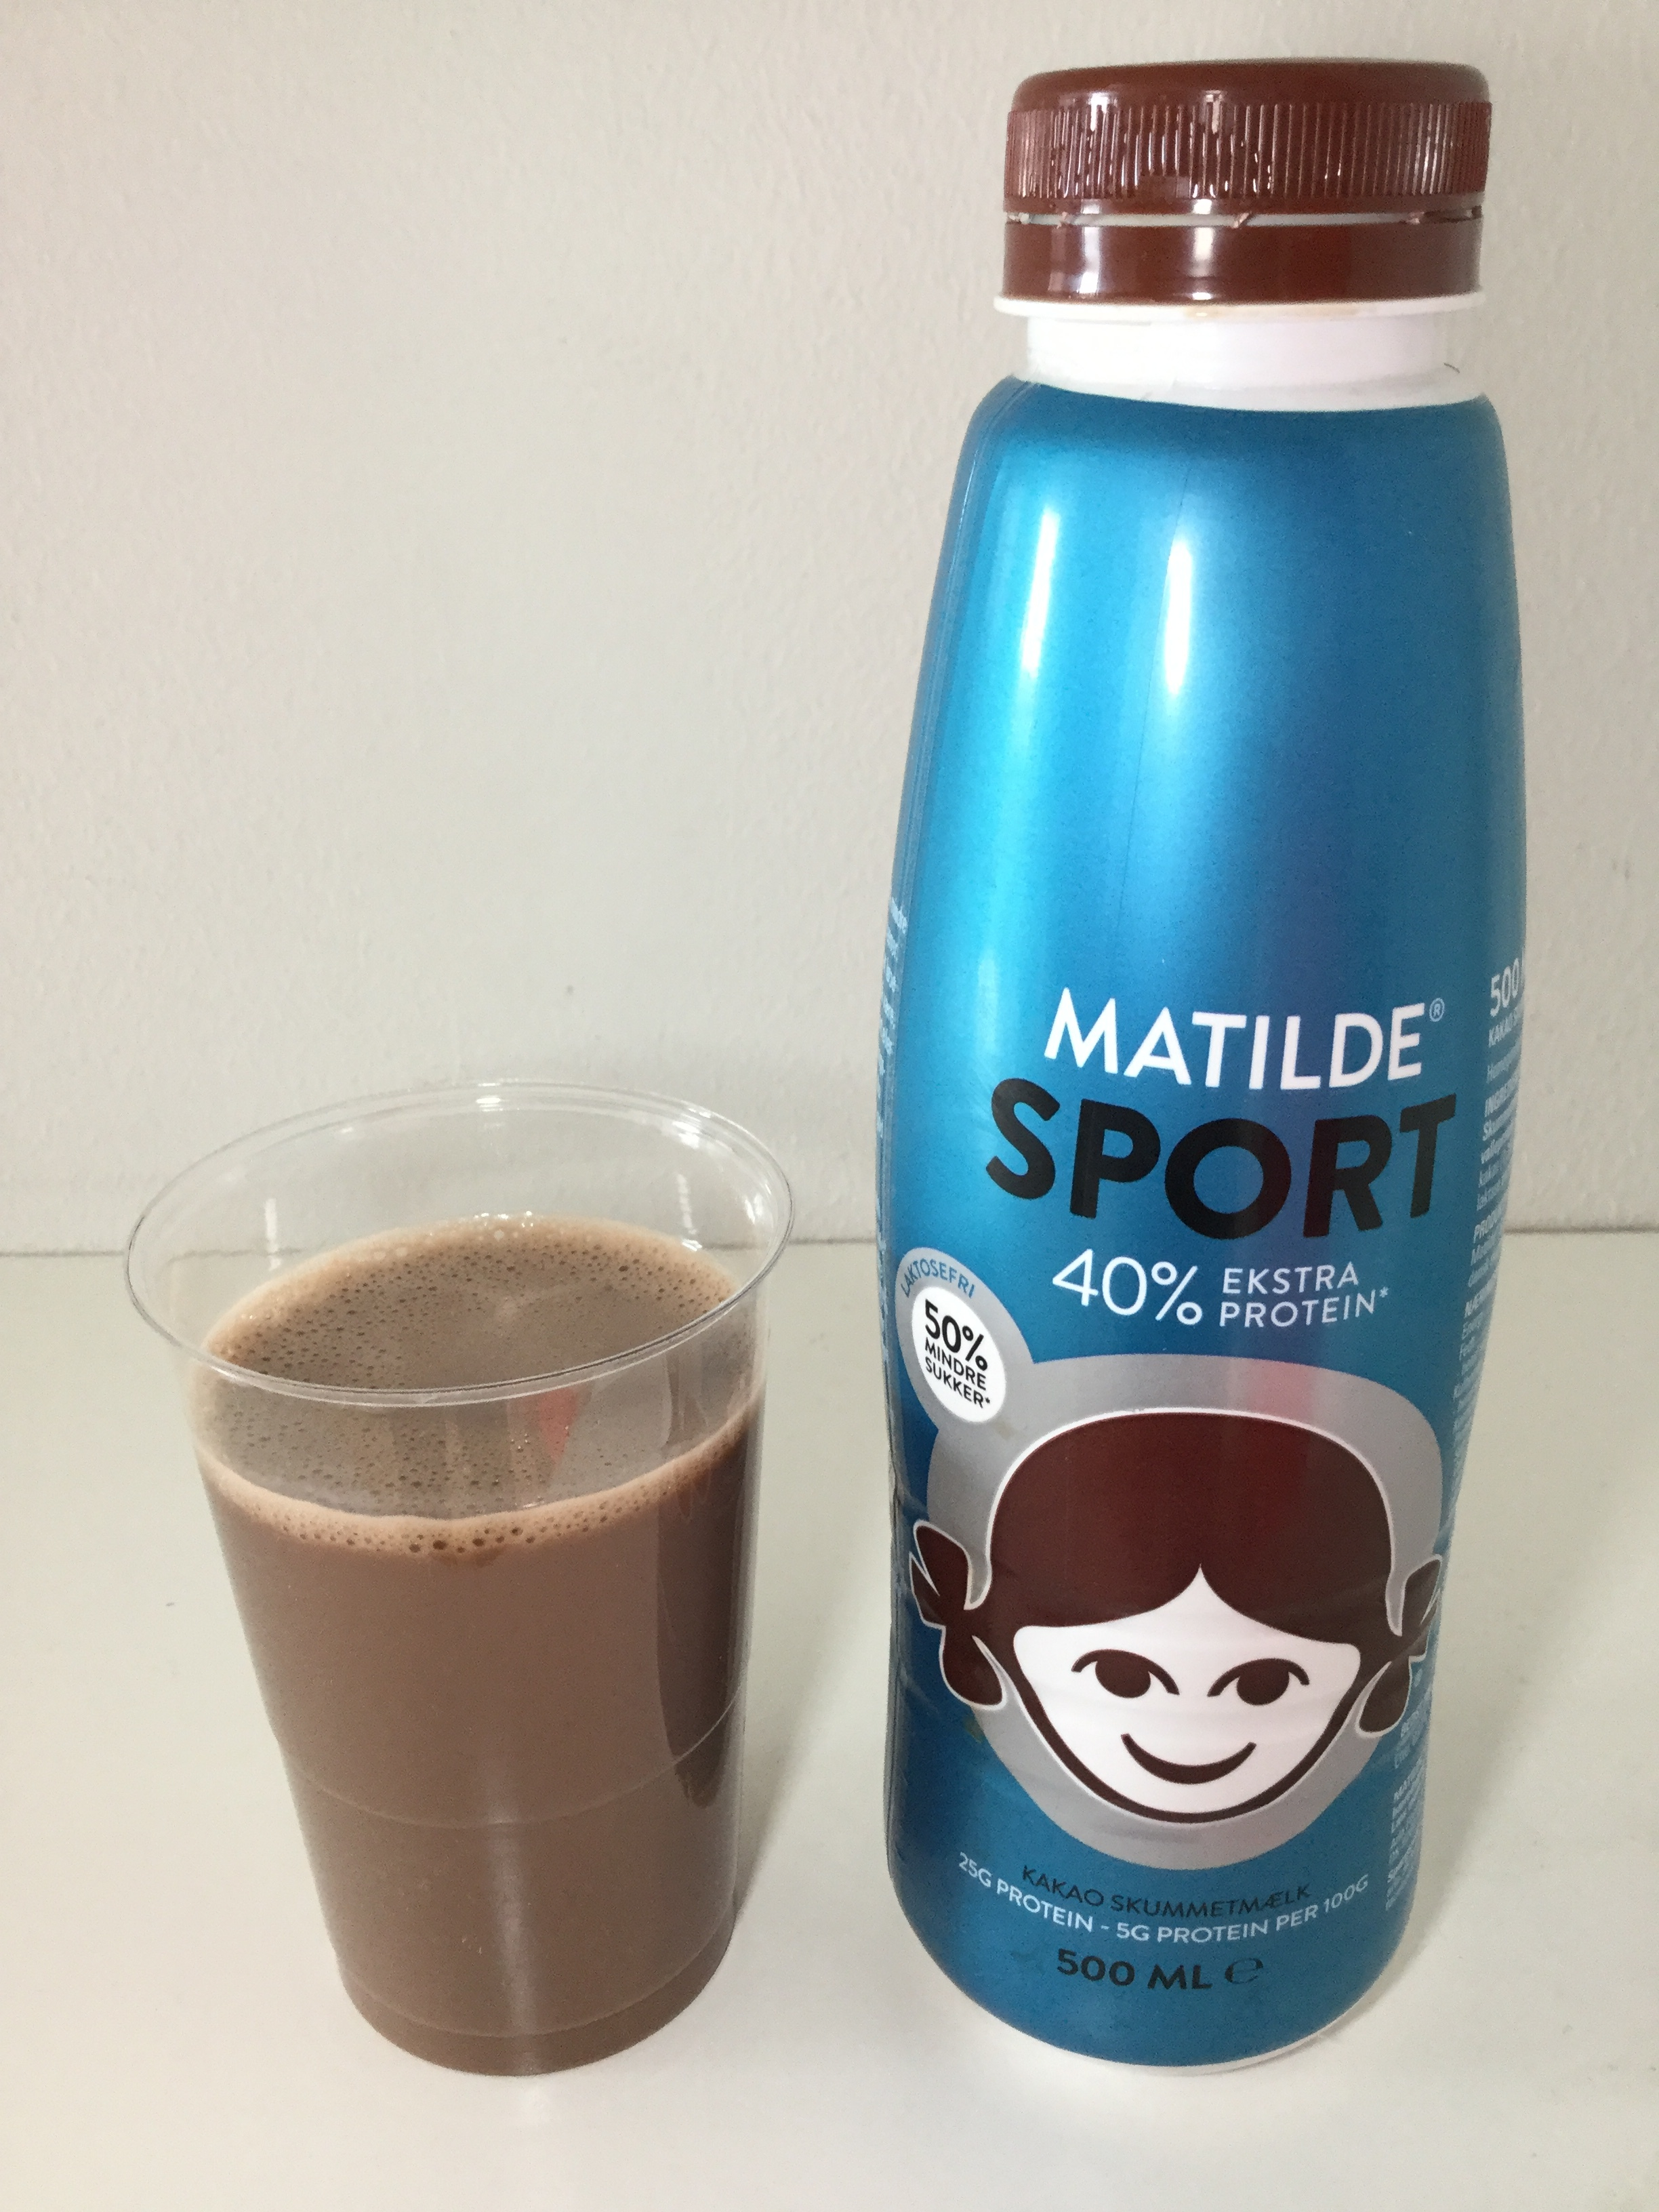 Matilde Sport 50% Less Sugar Cup